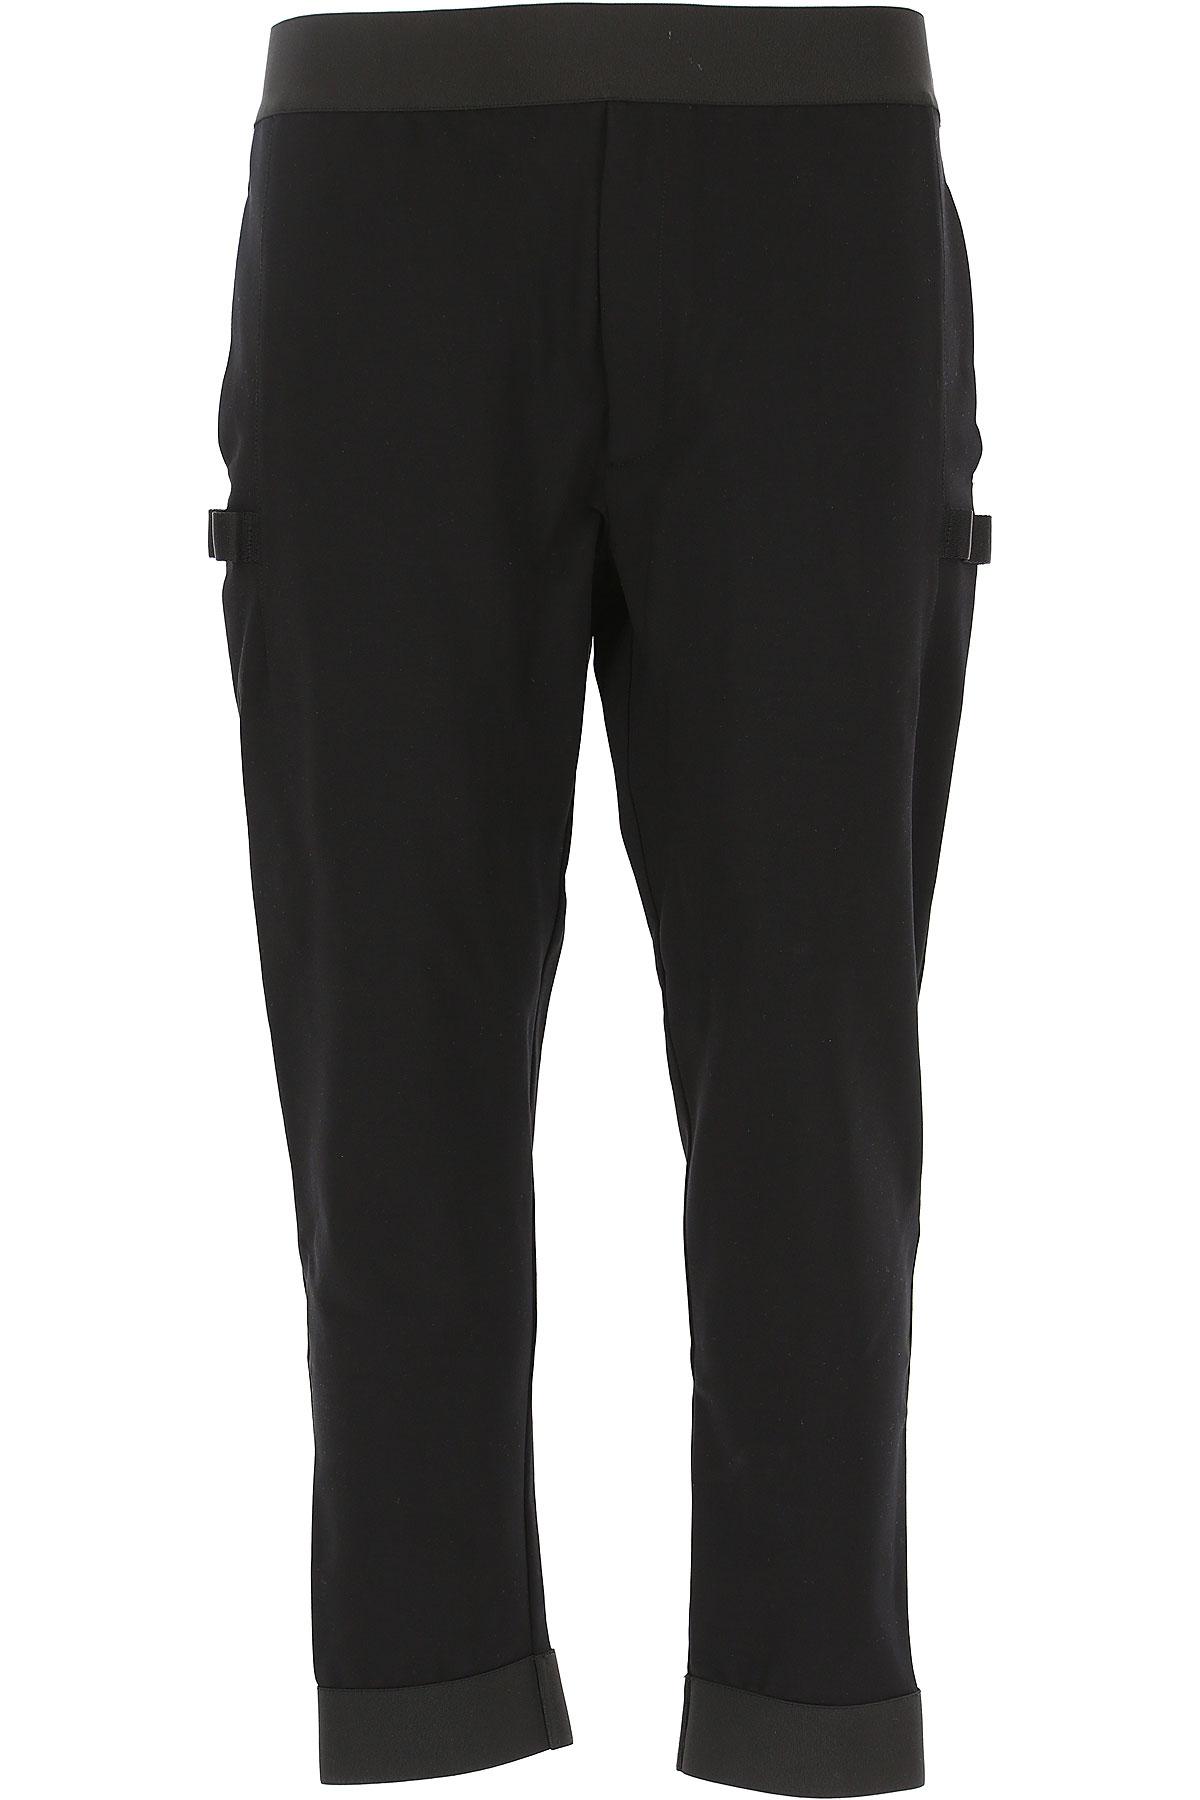 ALYX Pants for Men On Sale in Outlet, Black, Viscose, 2019, L (EU 50) M (EU 48)